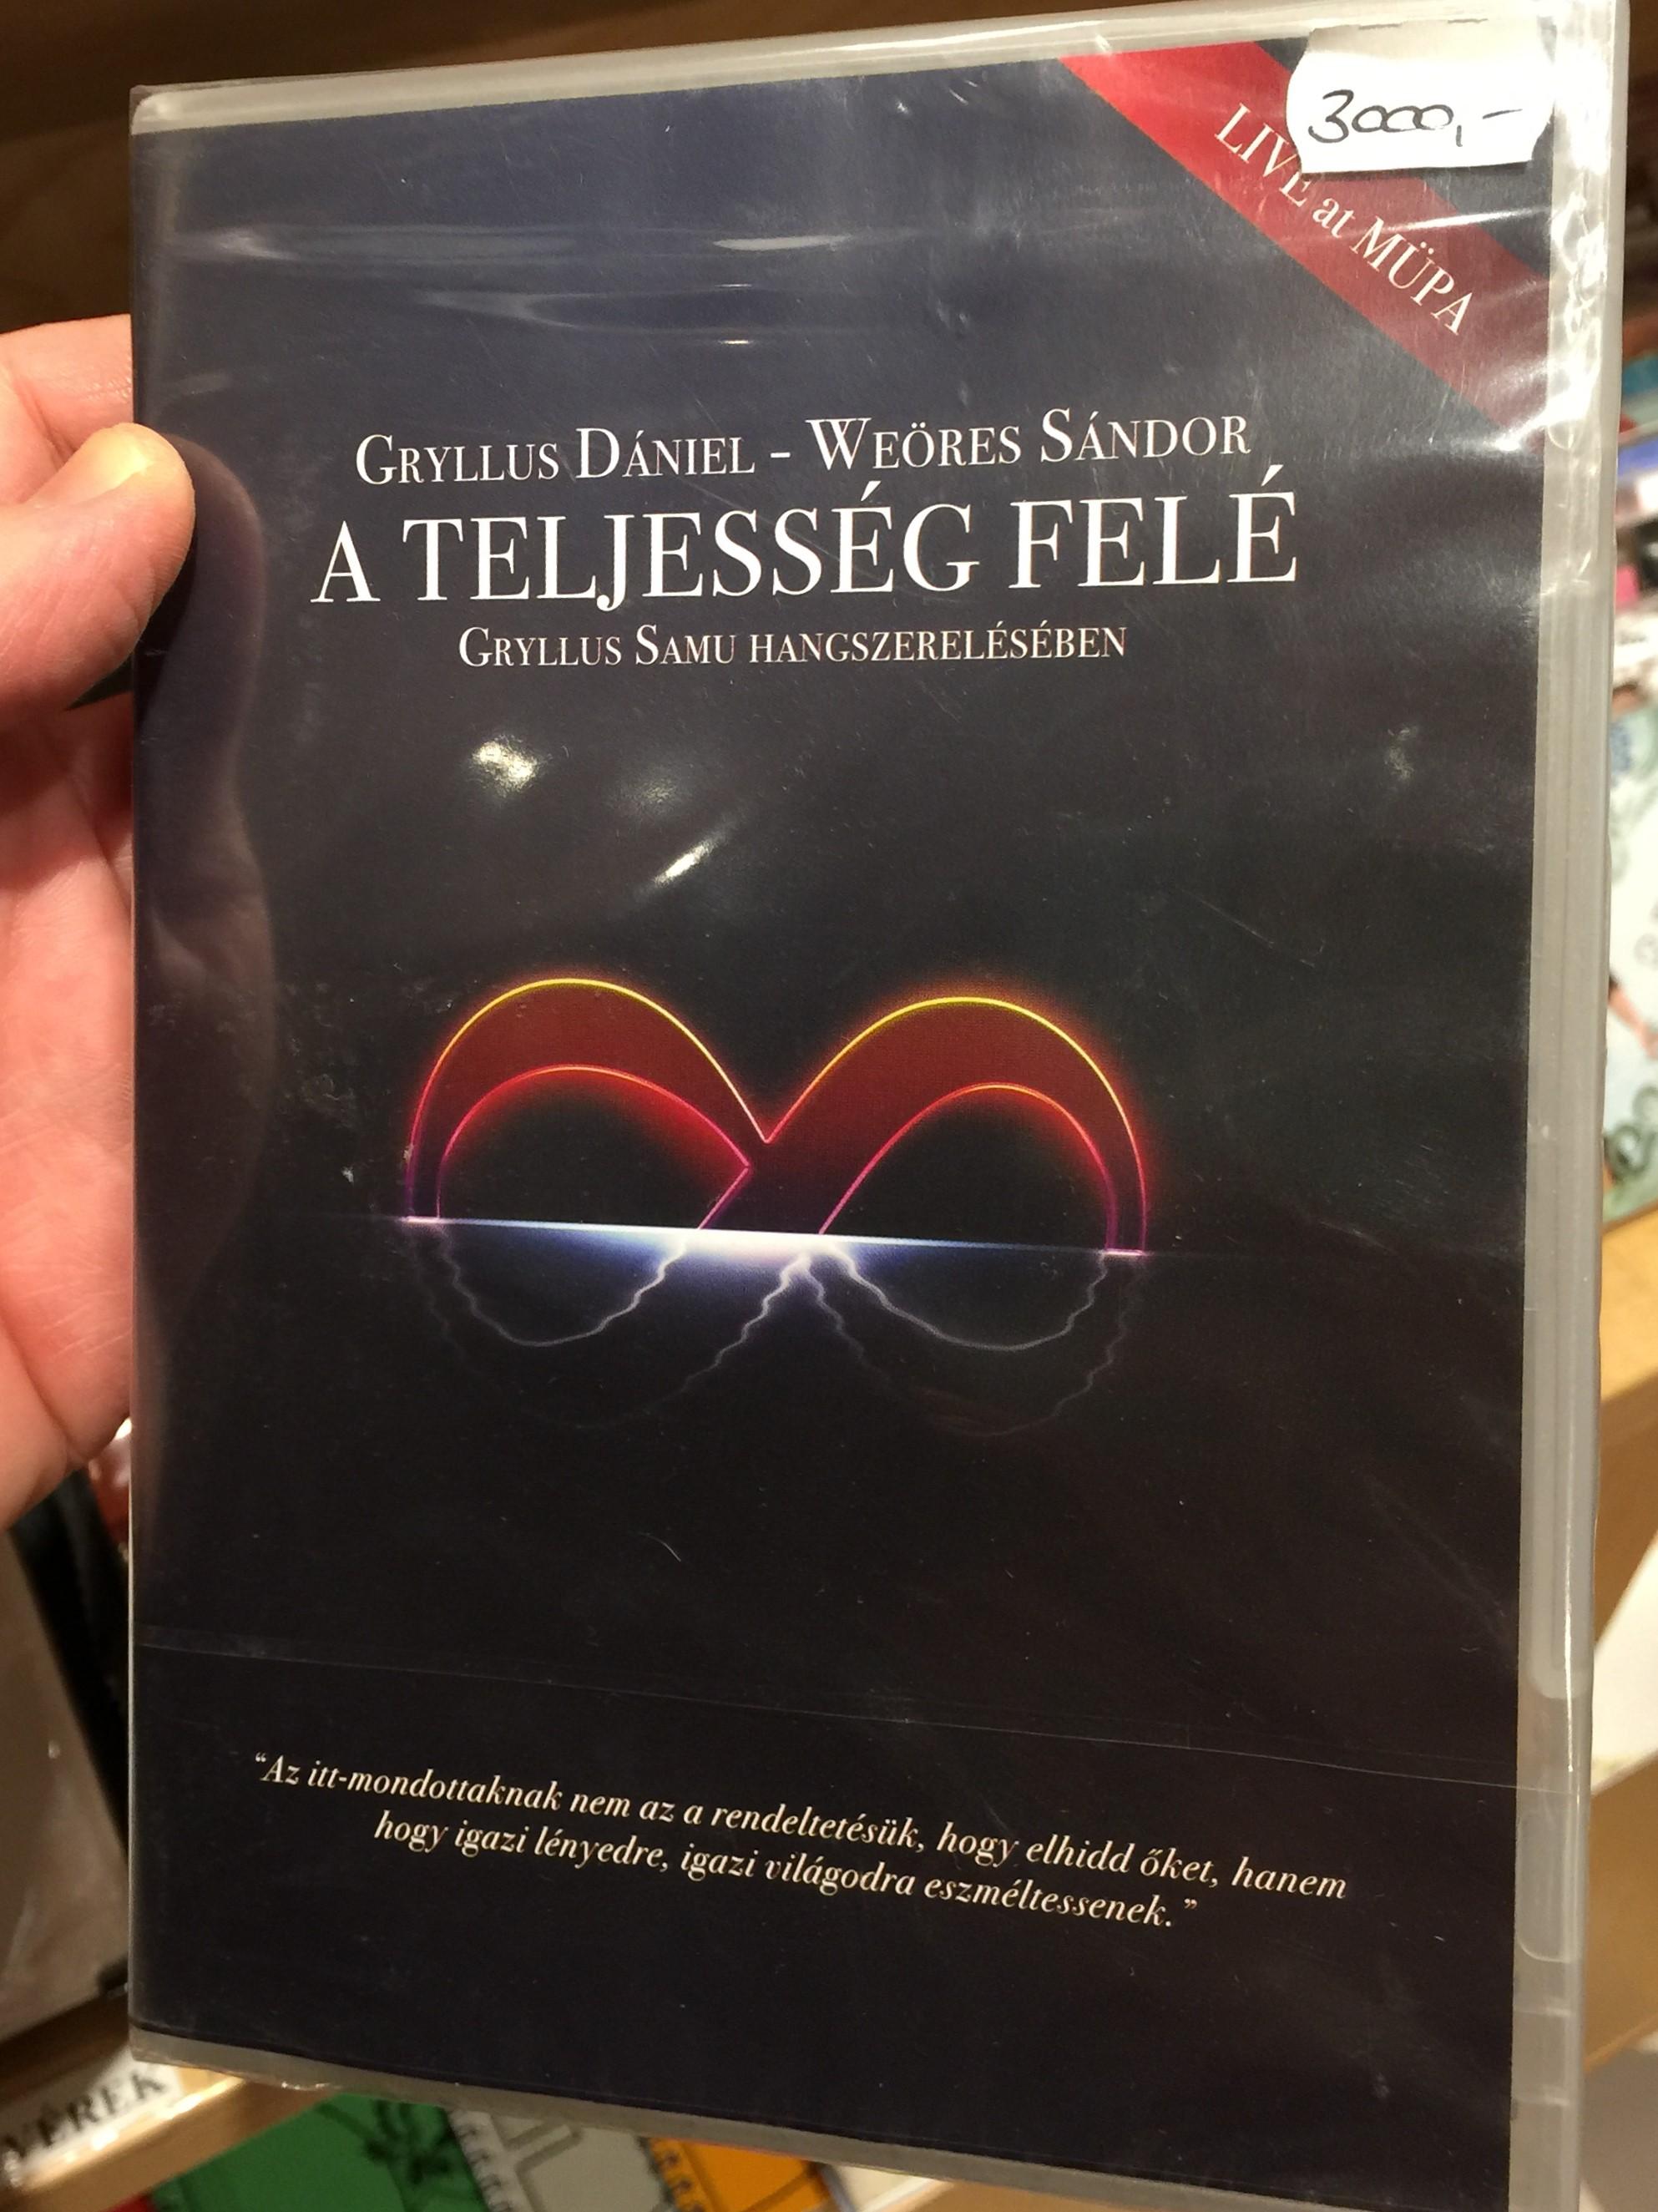 a-teljess-g-fel-dvd-2013-gryllus-d-niel-we-res-s-ndor-1.jpg